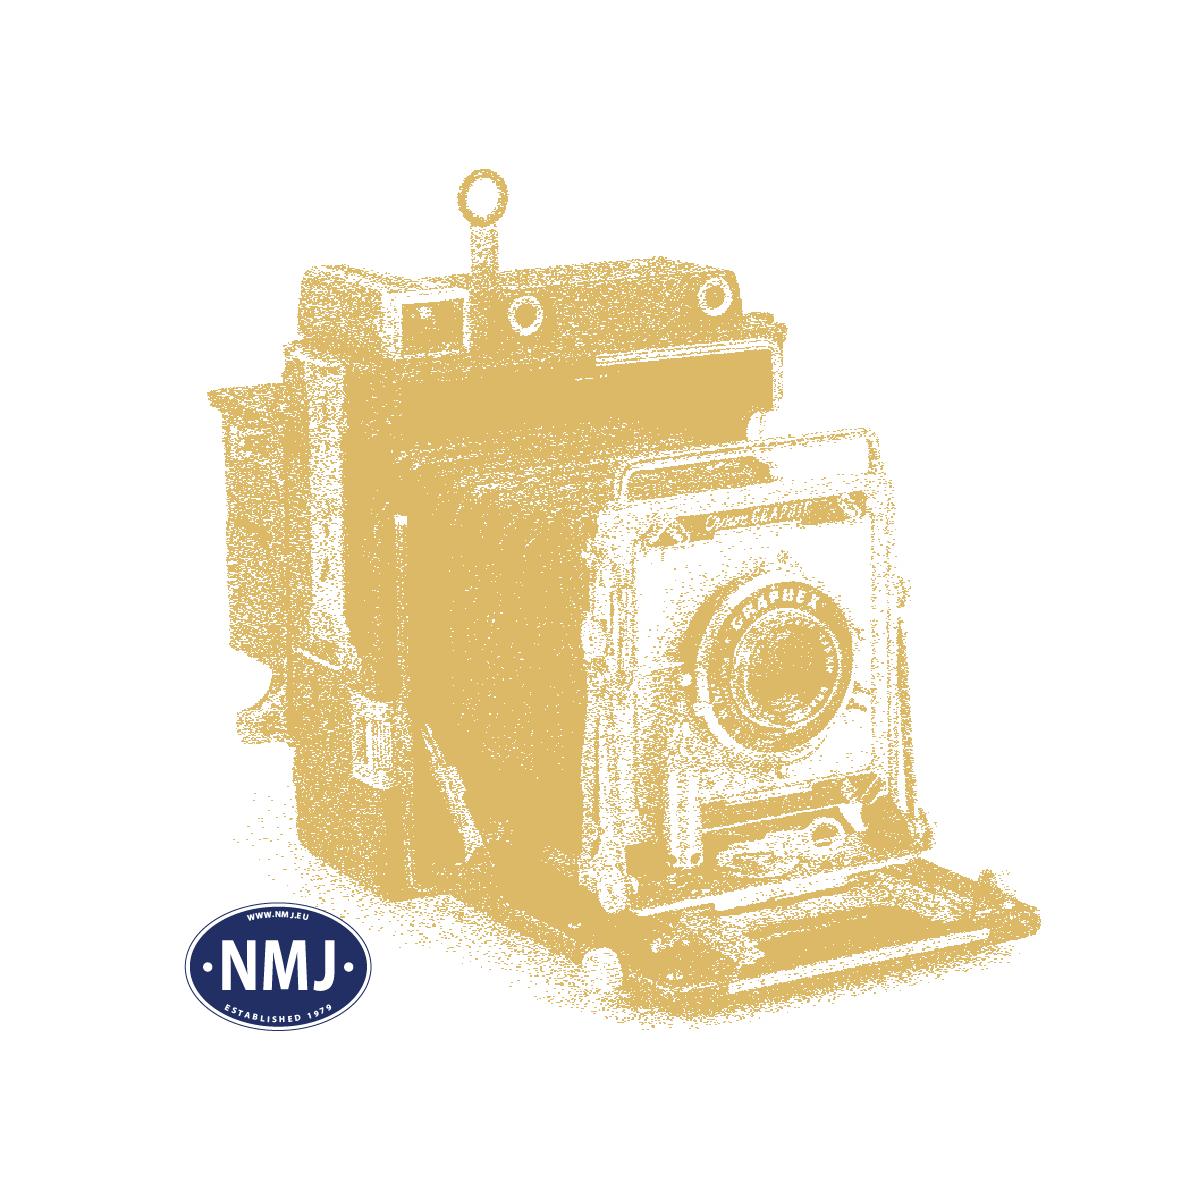 NMJT84.203 - NMJ Topline NSB BM69A.06, DCC w/ Sound